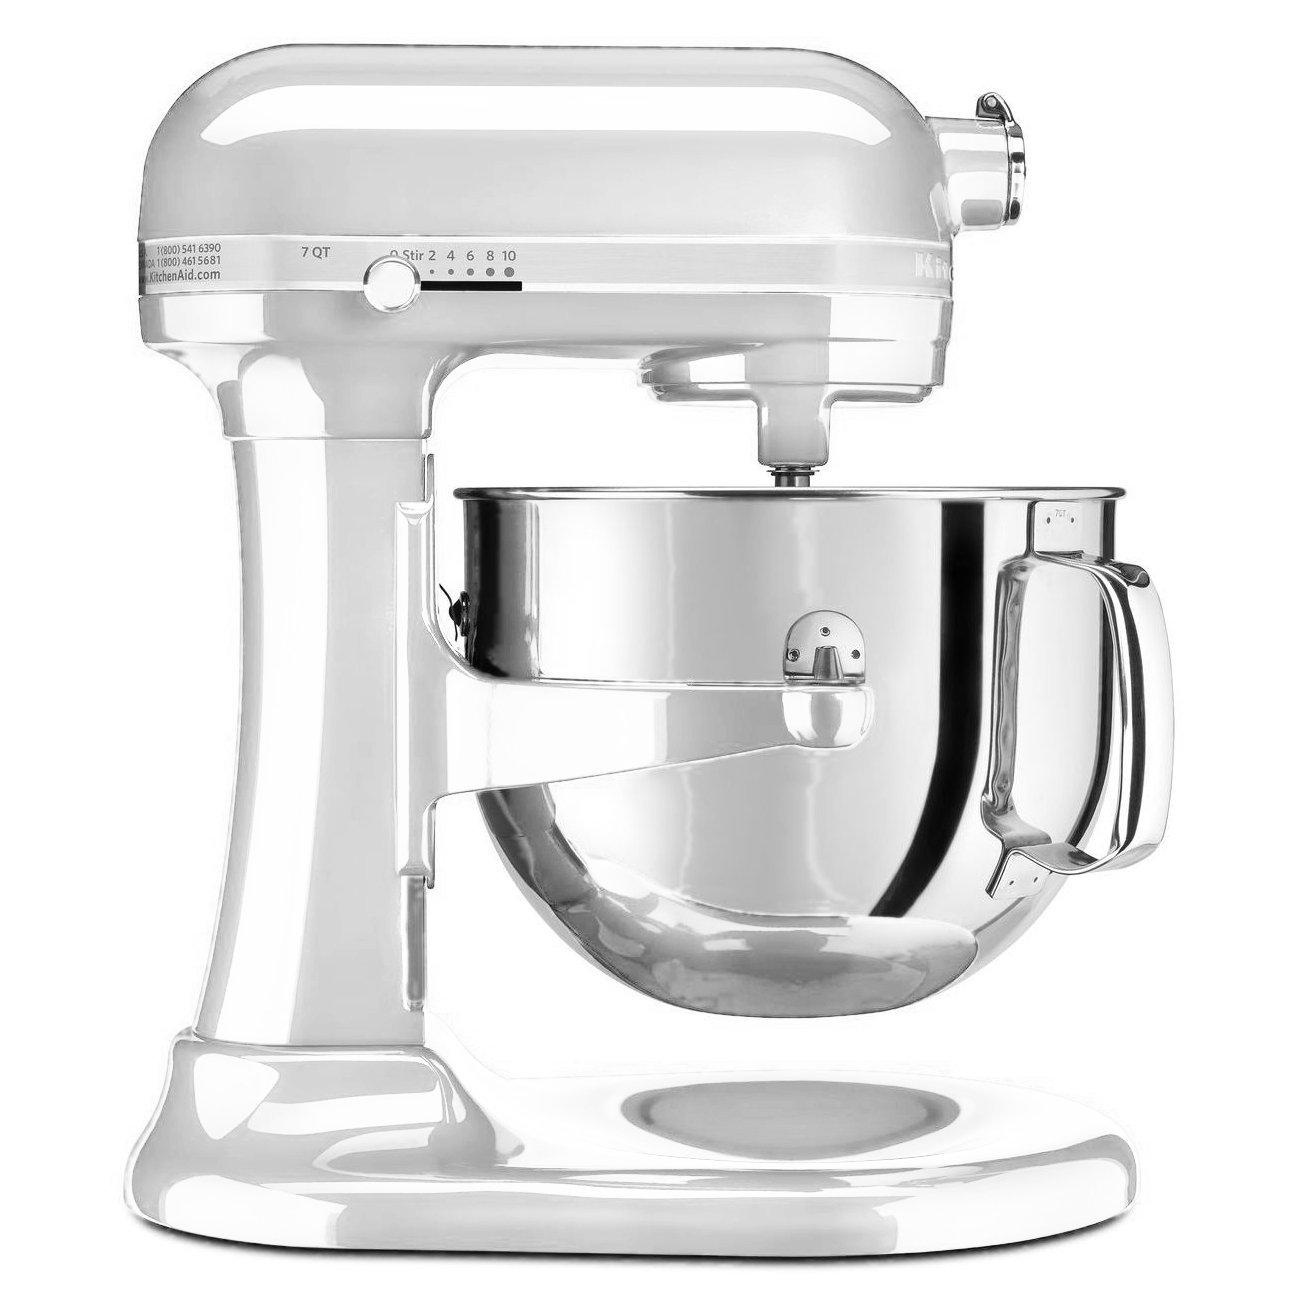 ㊣胡蜂正品㊣ 預購 KitchenAid KSM7586PFP 7-Quart 7QT Pro Line Stand Mixer black 升降式攪拌機 ( 白色 )